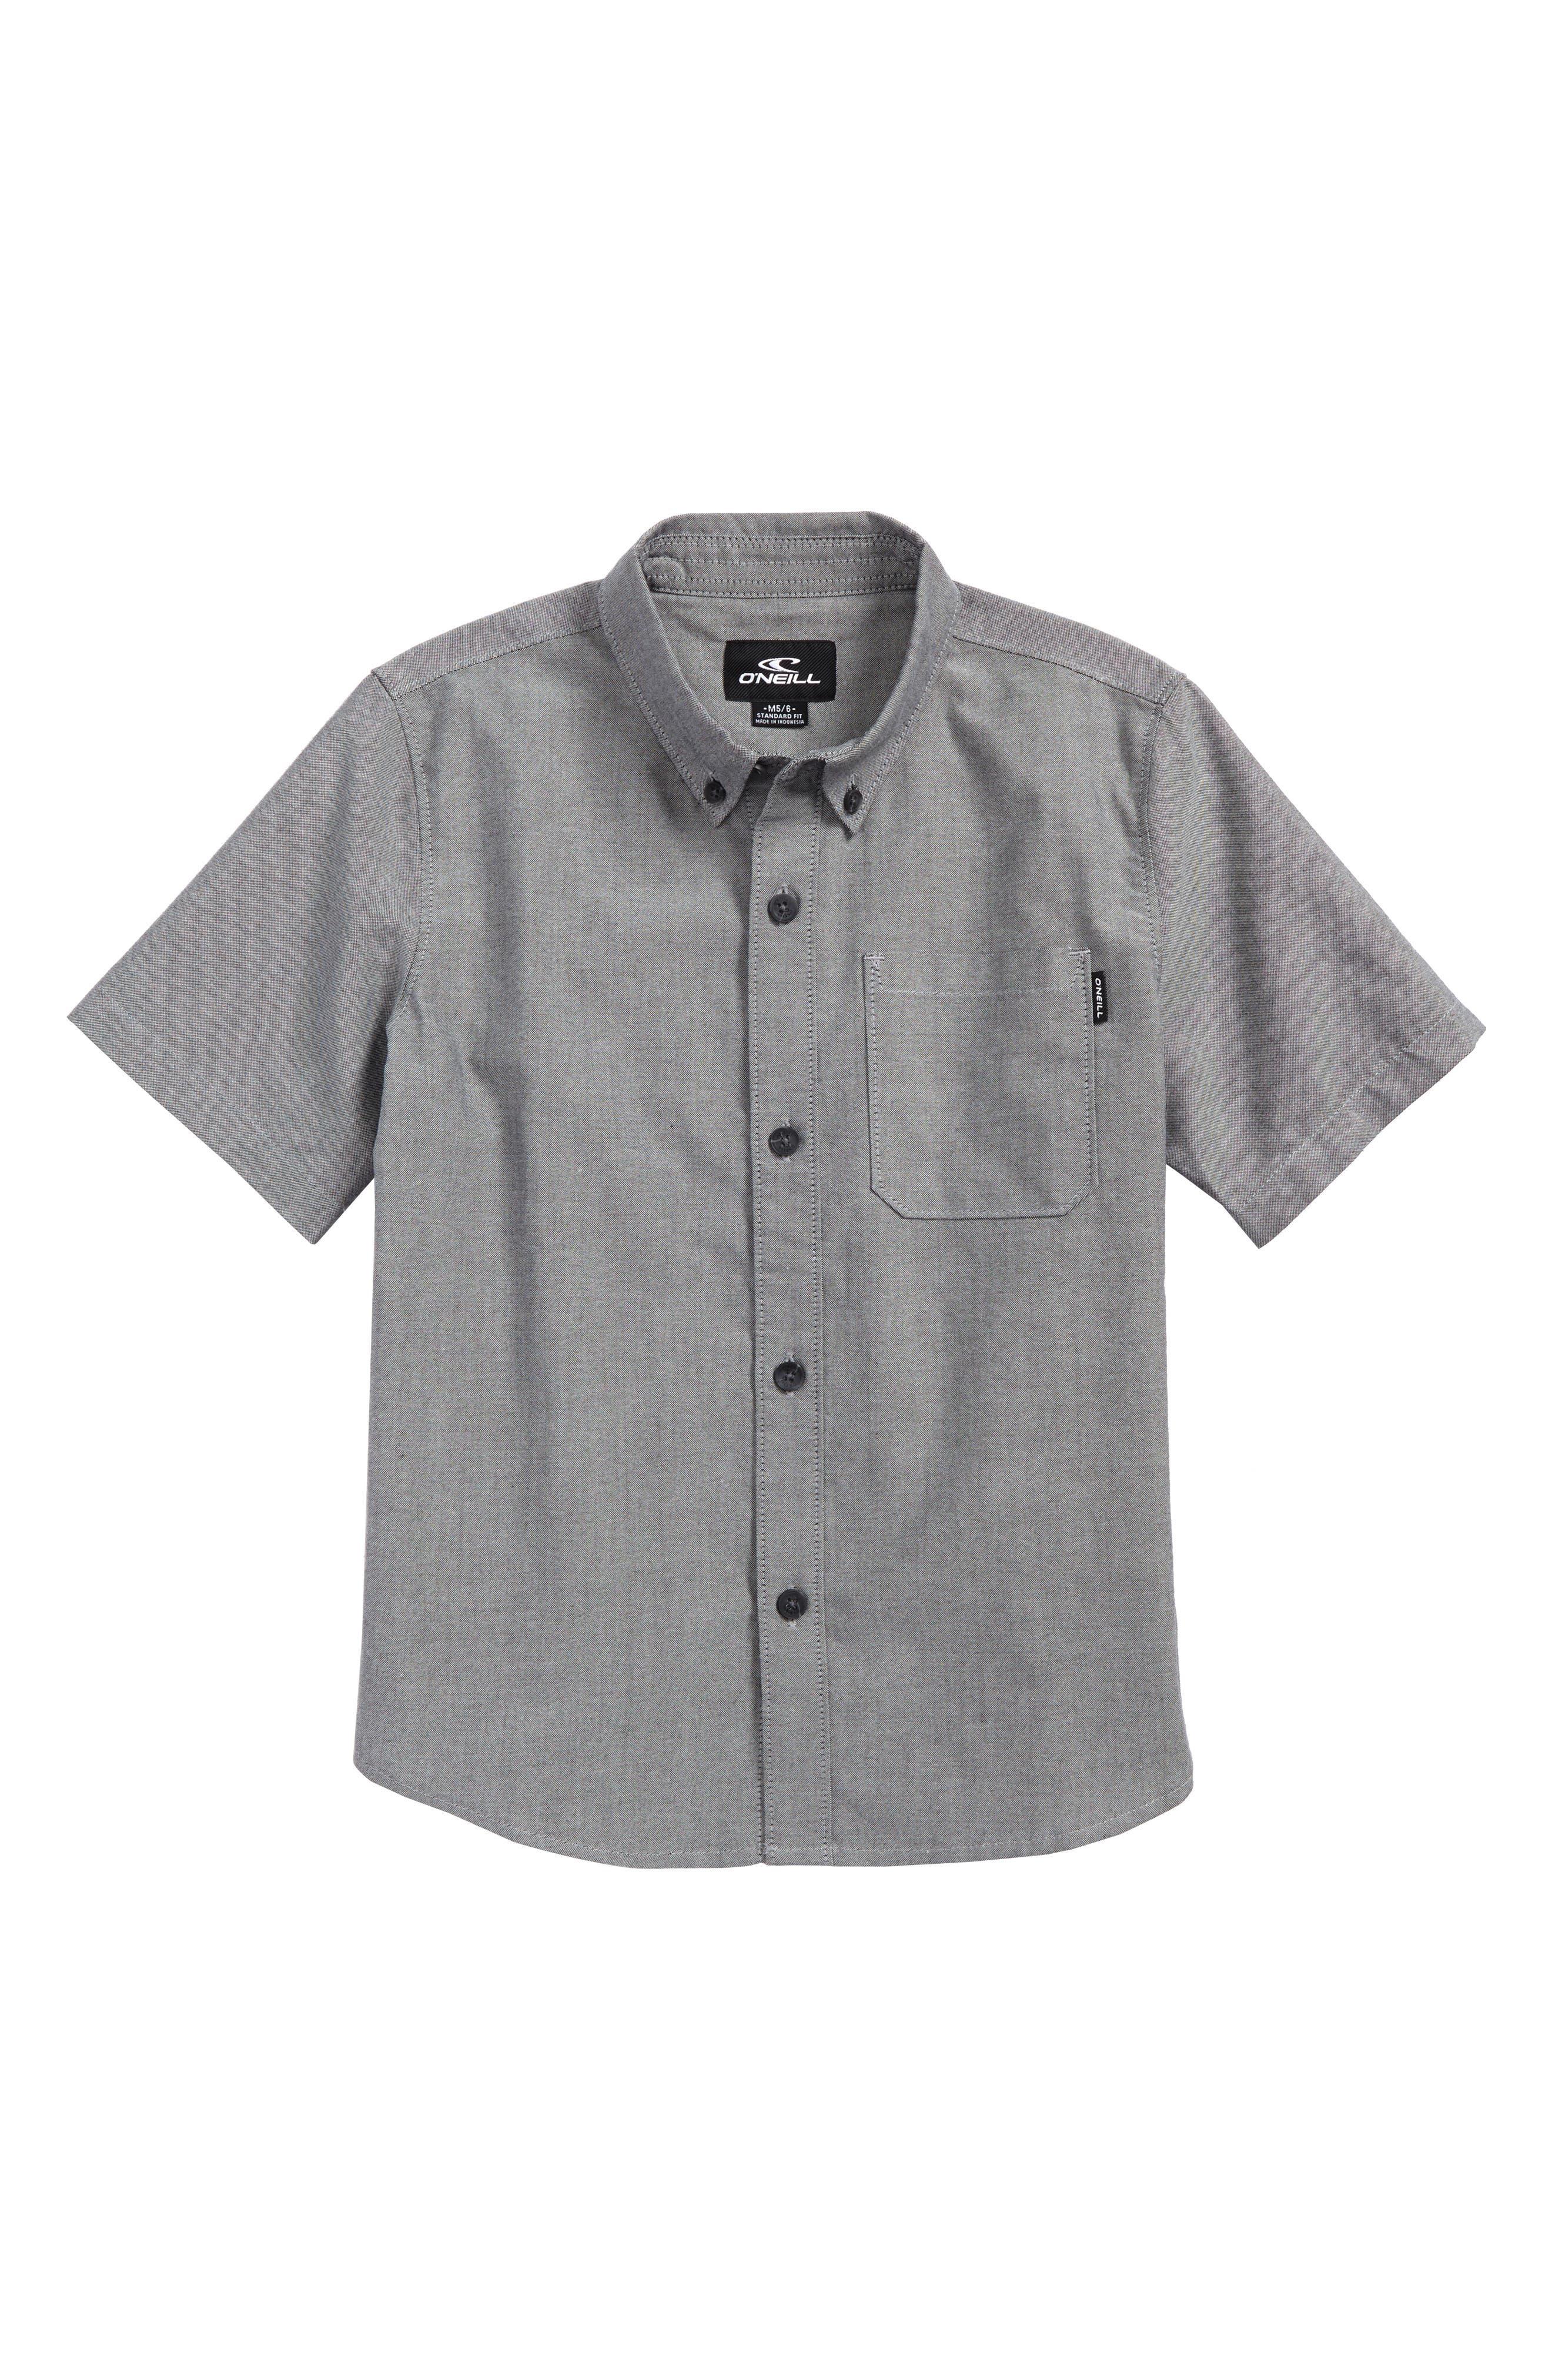 Alternate Image 1 Selected - O'Neill Banks Woven Shirt (Toddler Boys, Little Boys & Big Boys)